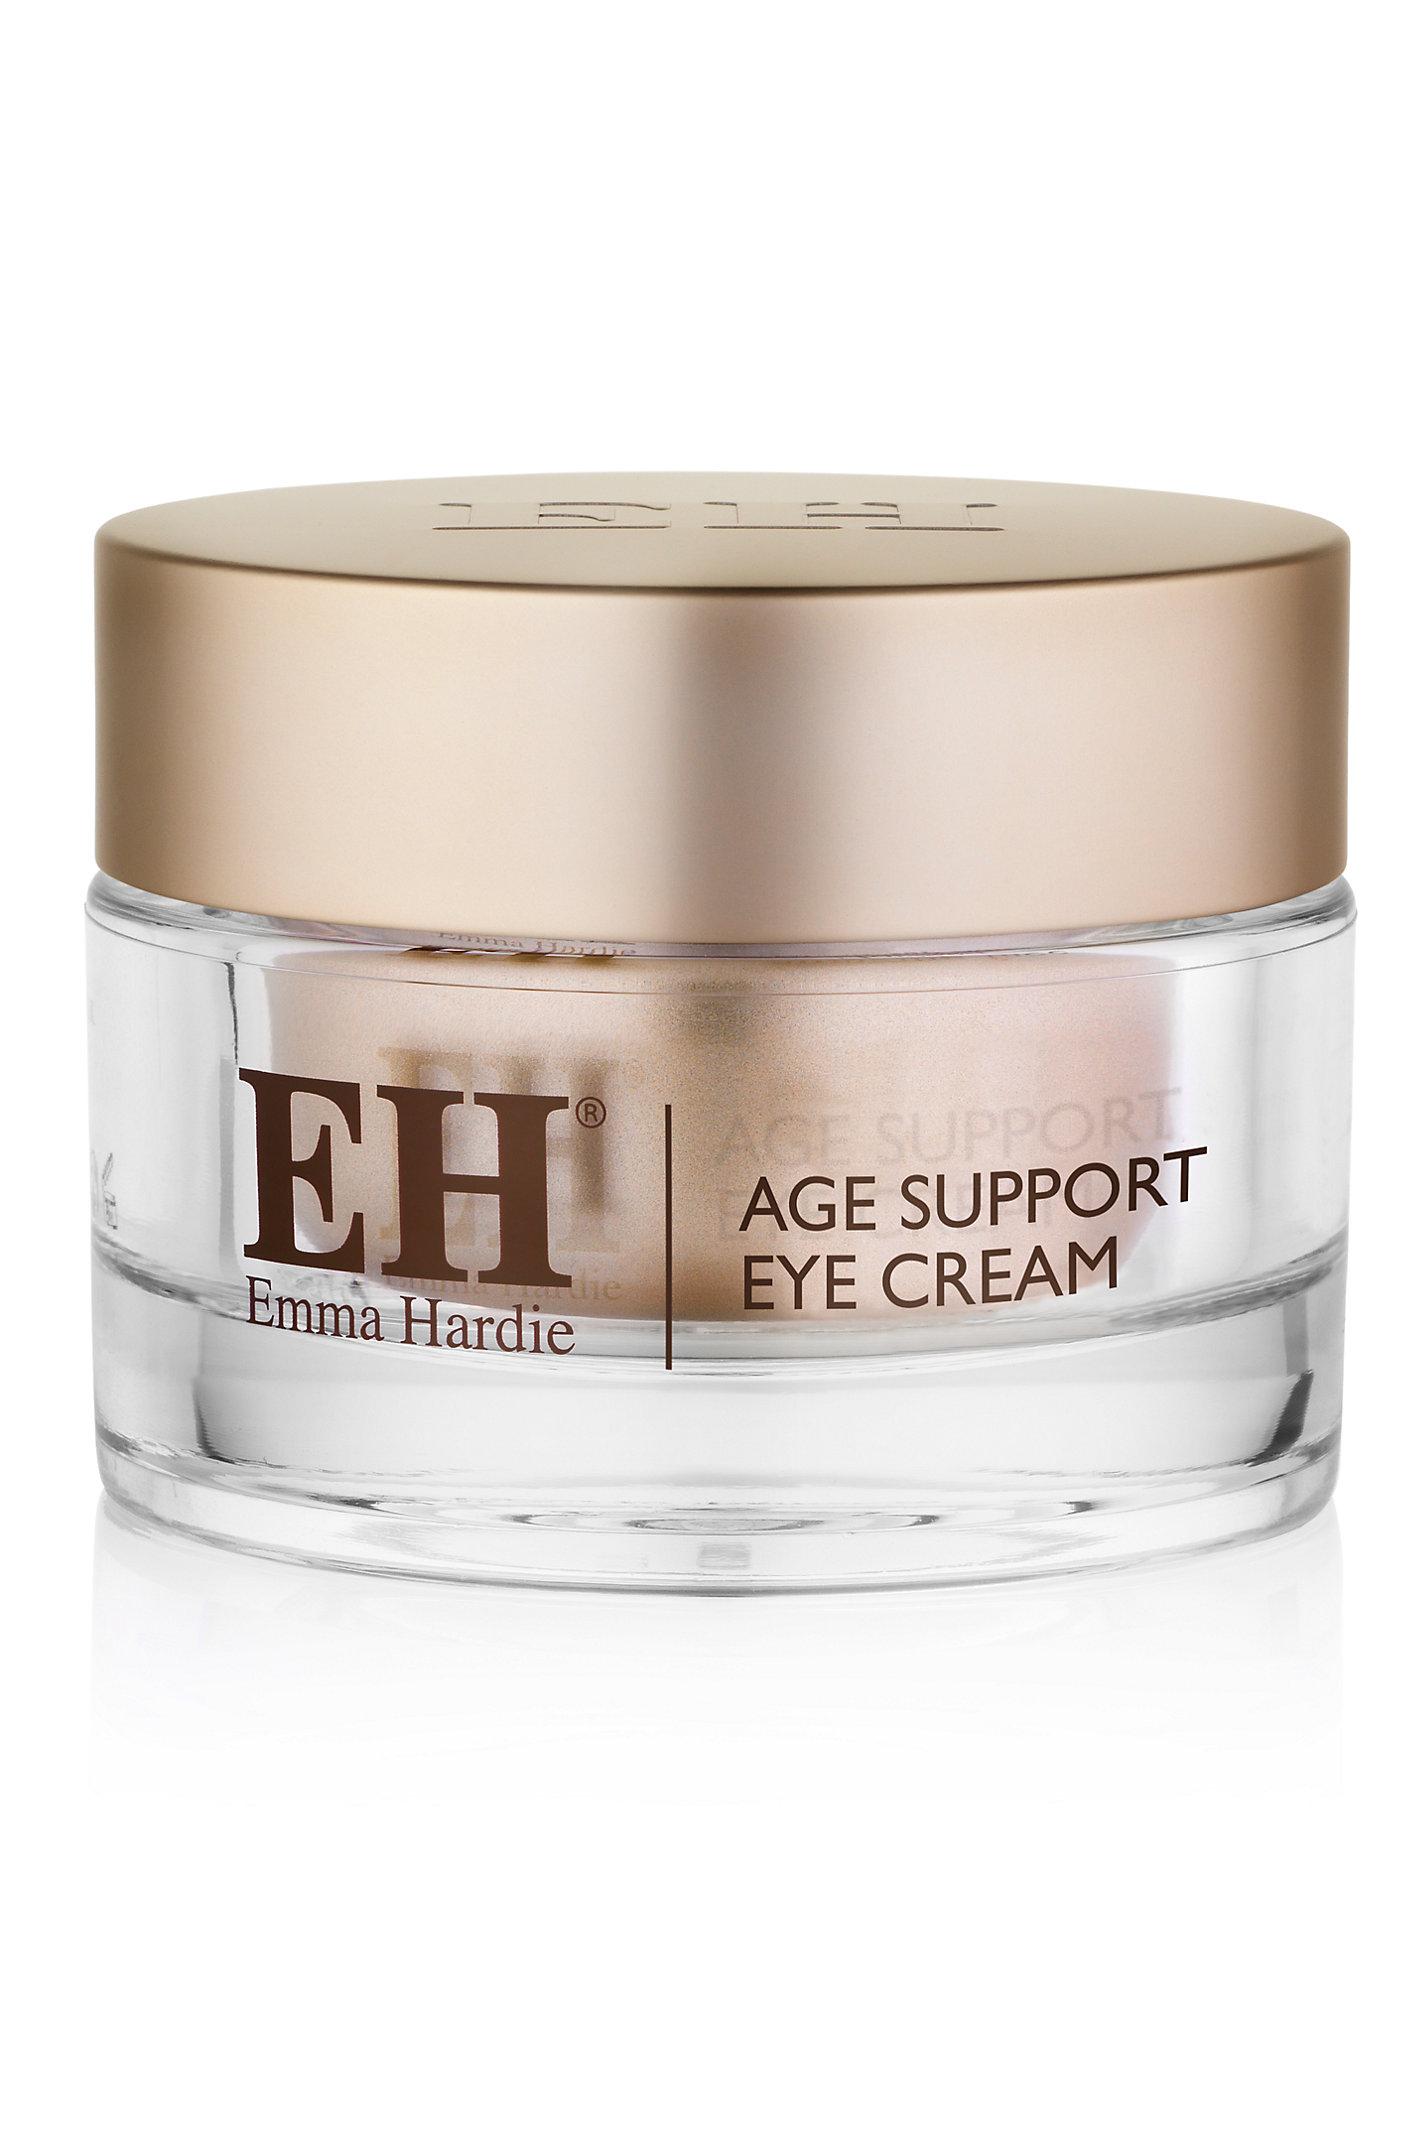 Age Support Eye Cream